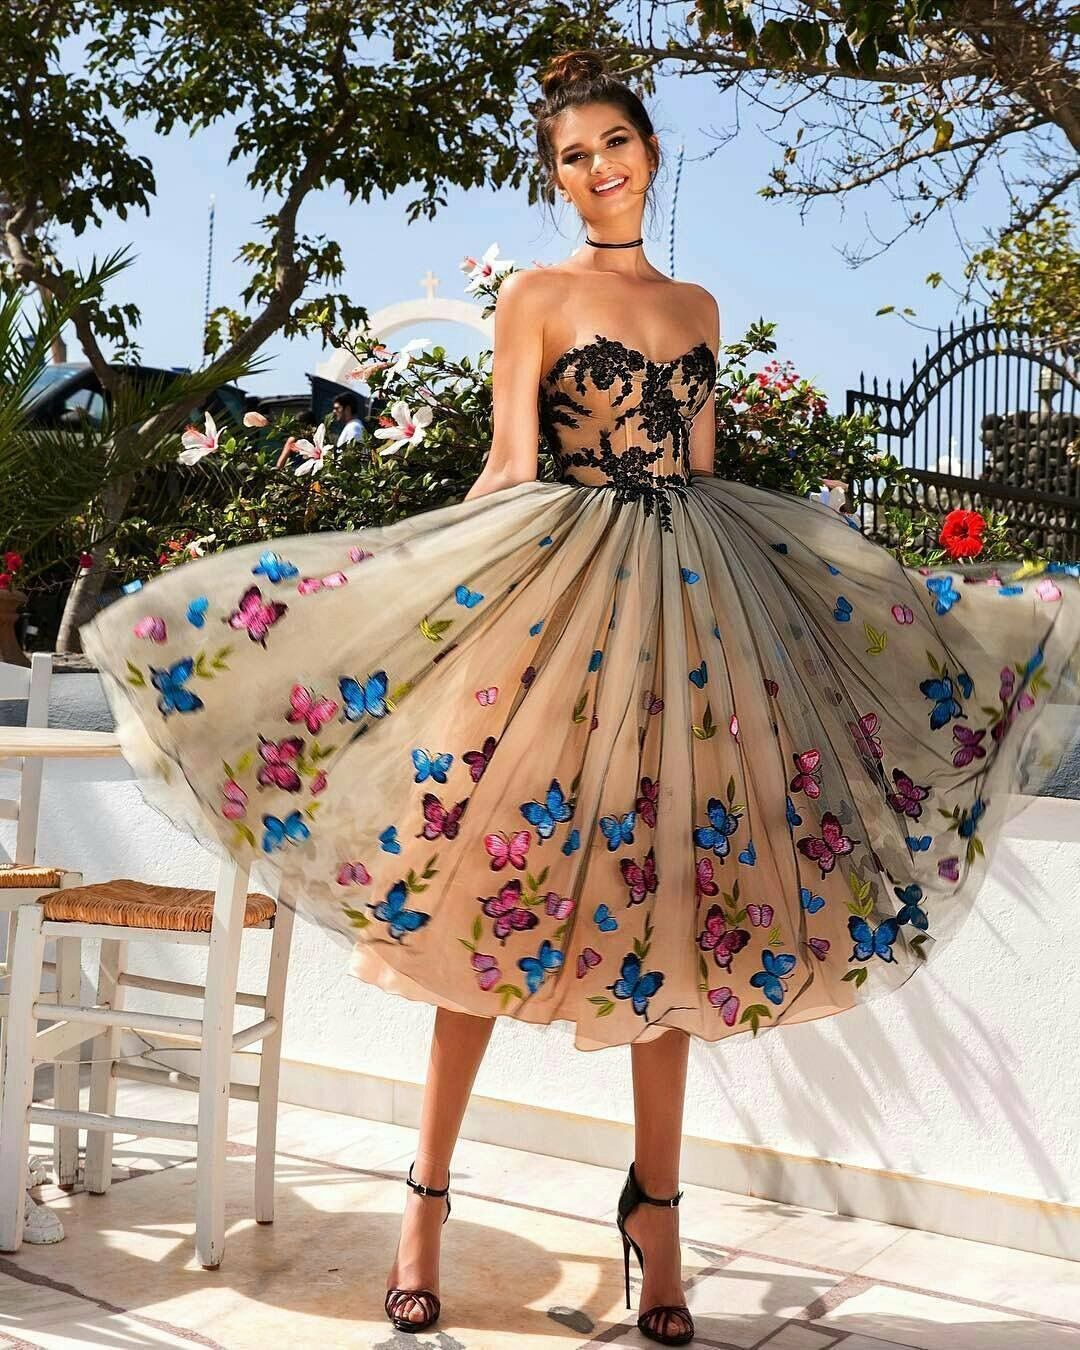 Pin by eliannah on dress ideas pinterest dresses prom dresses